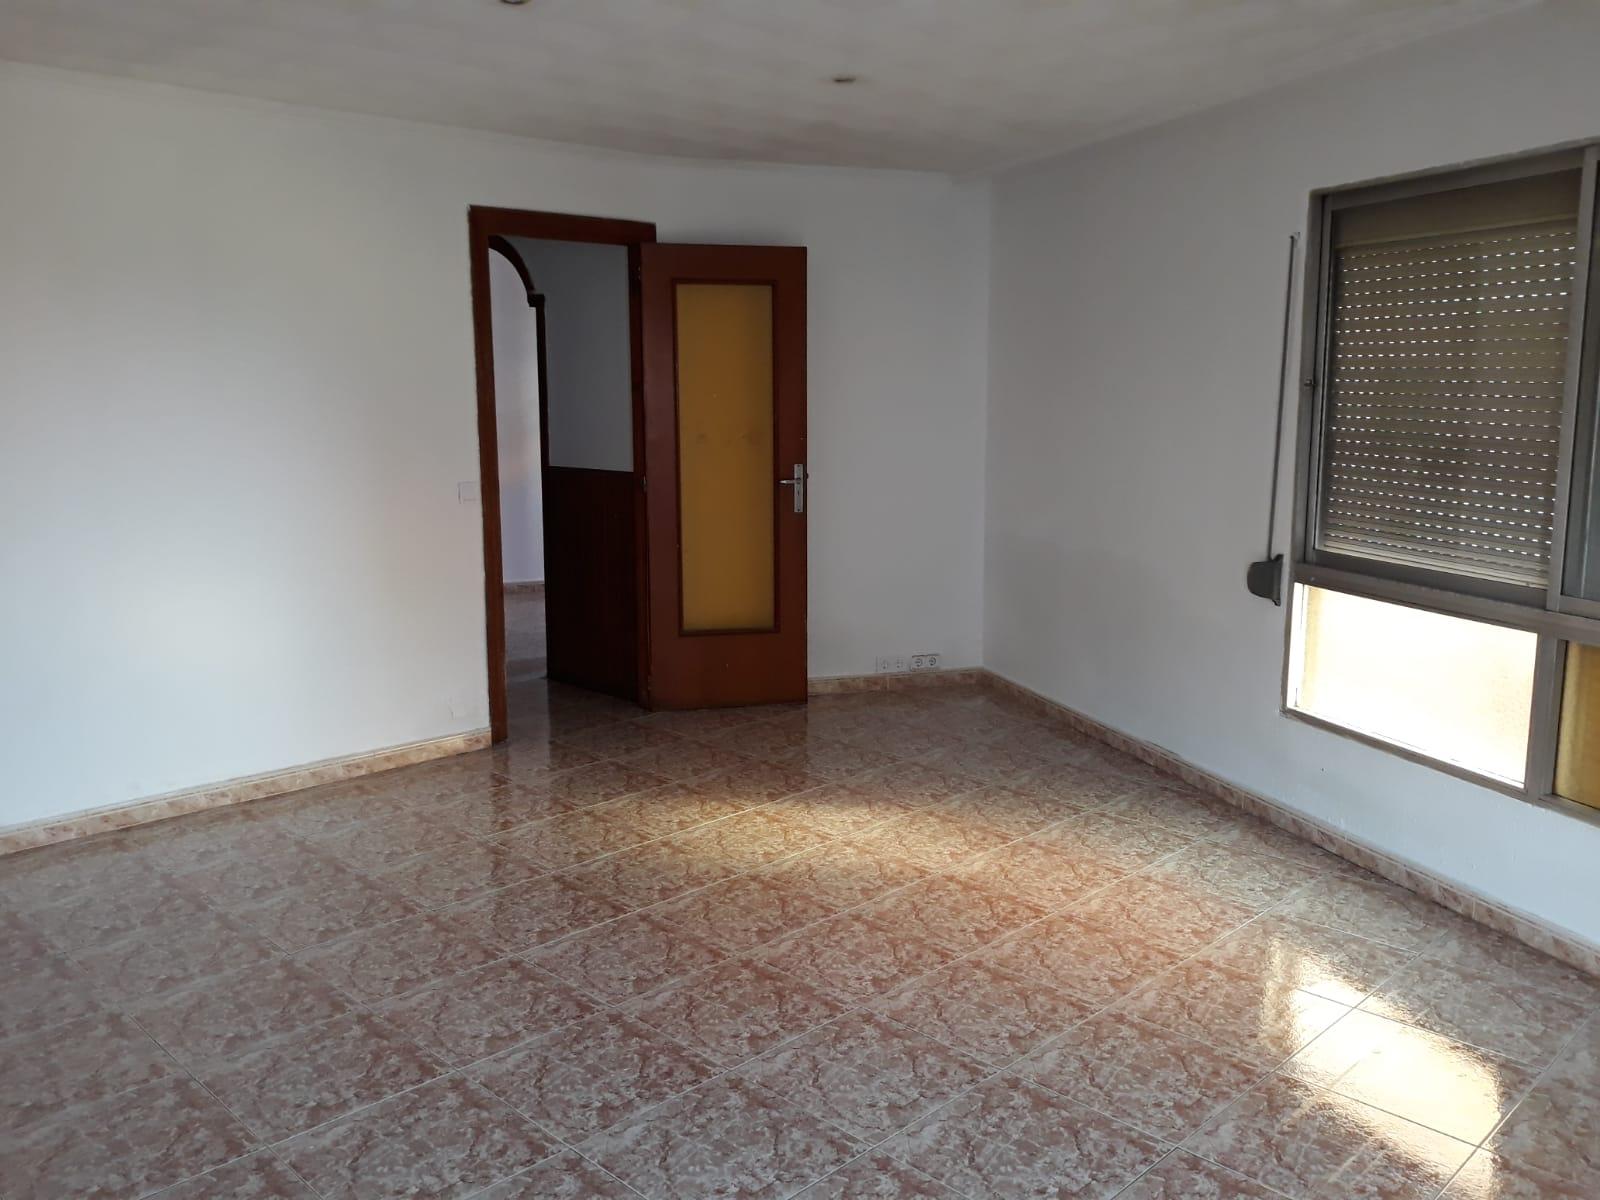 Alquiler Piso  Cm salart. Solvia inmobiliaria - piso palma de mallorca